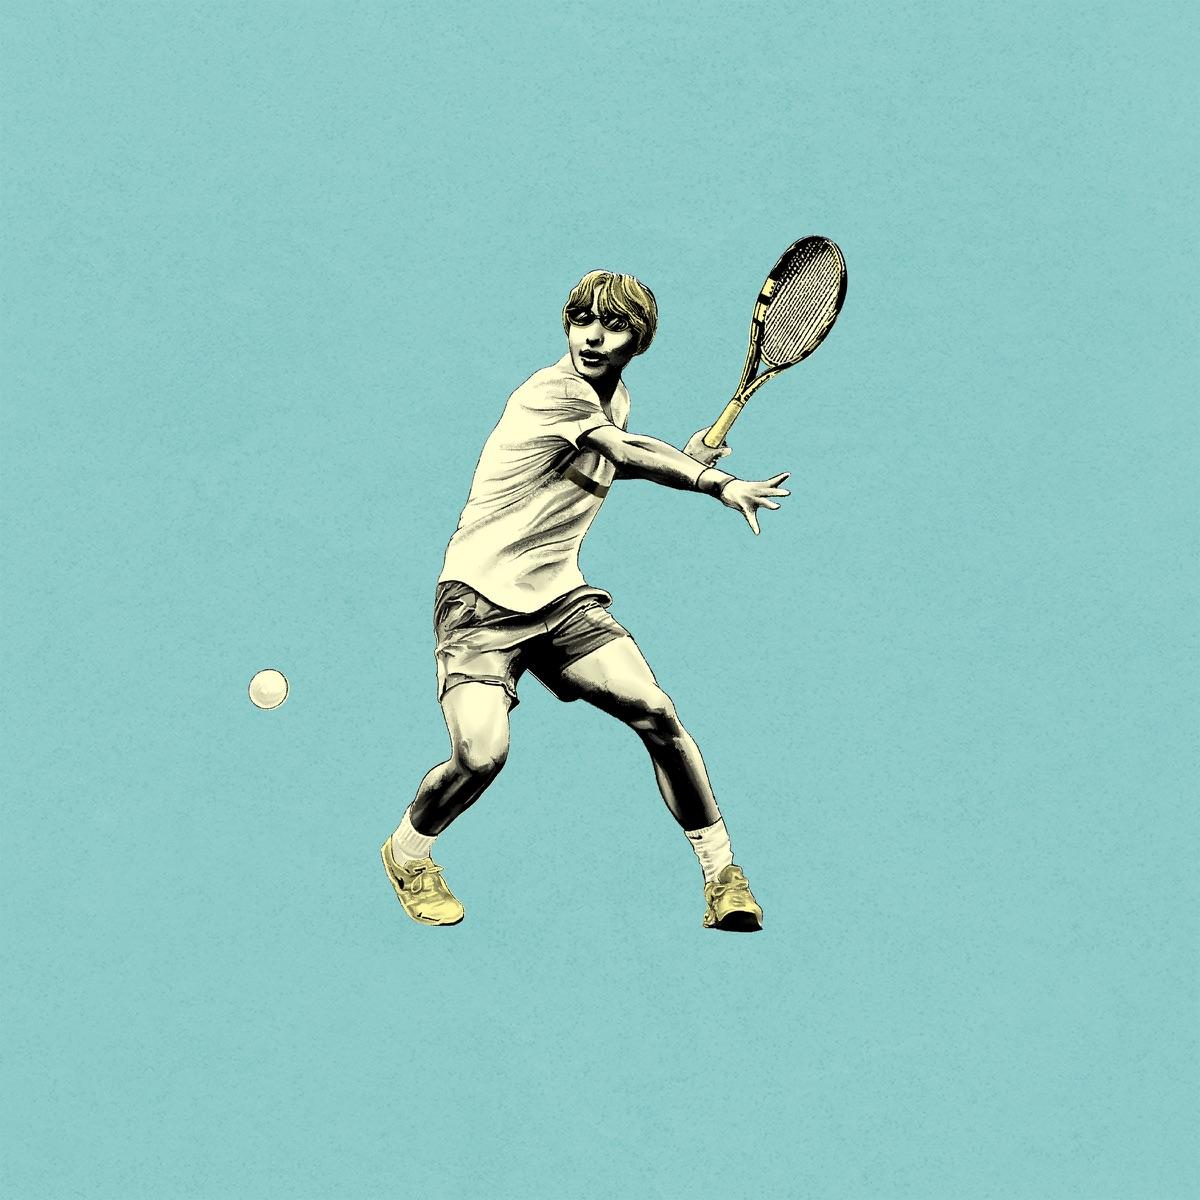 『Mega Shinnosuke - Sports』収録の『Sports』ジャケット